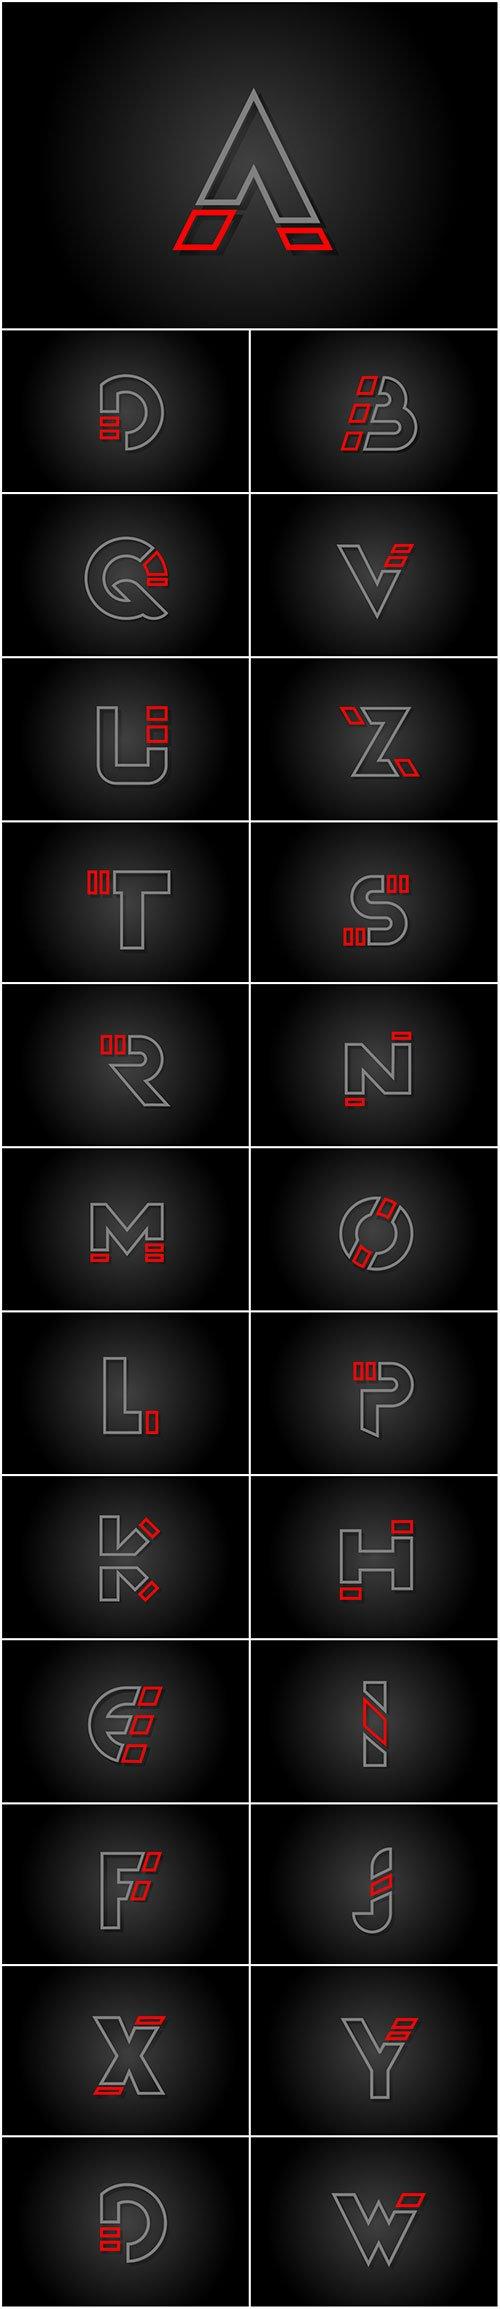 Alphabet line letter red black for company logo icon design